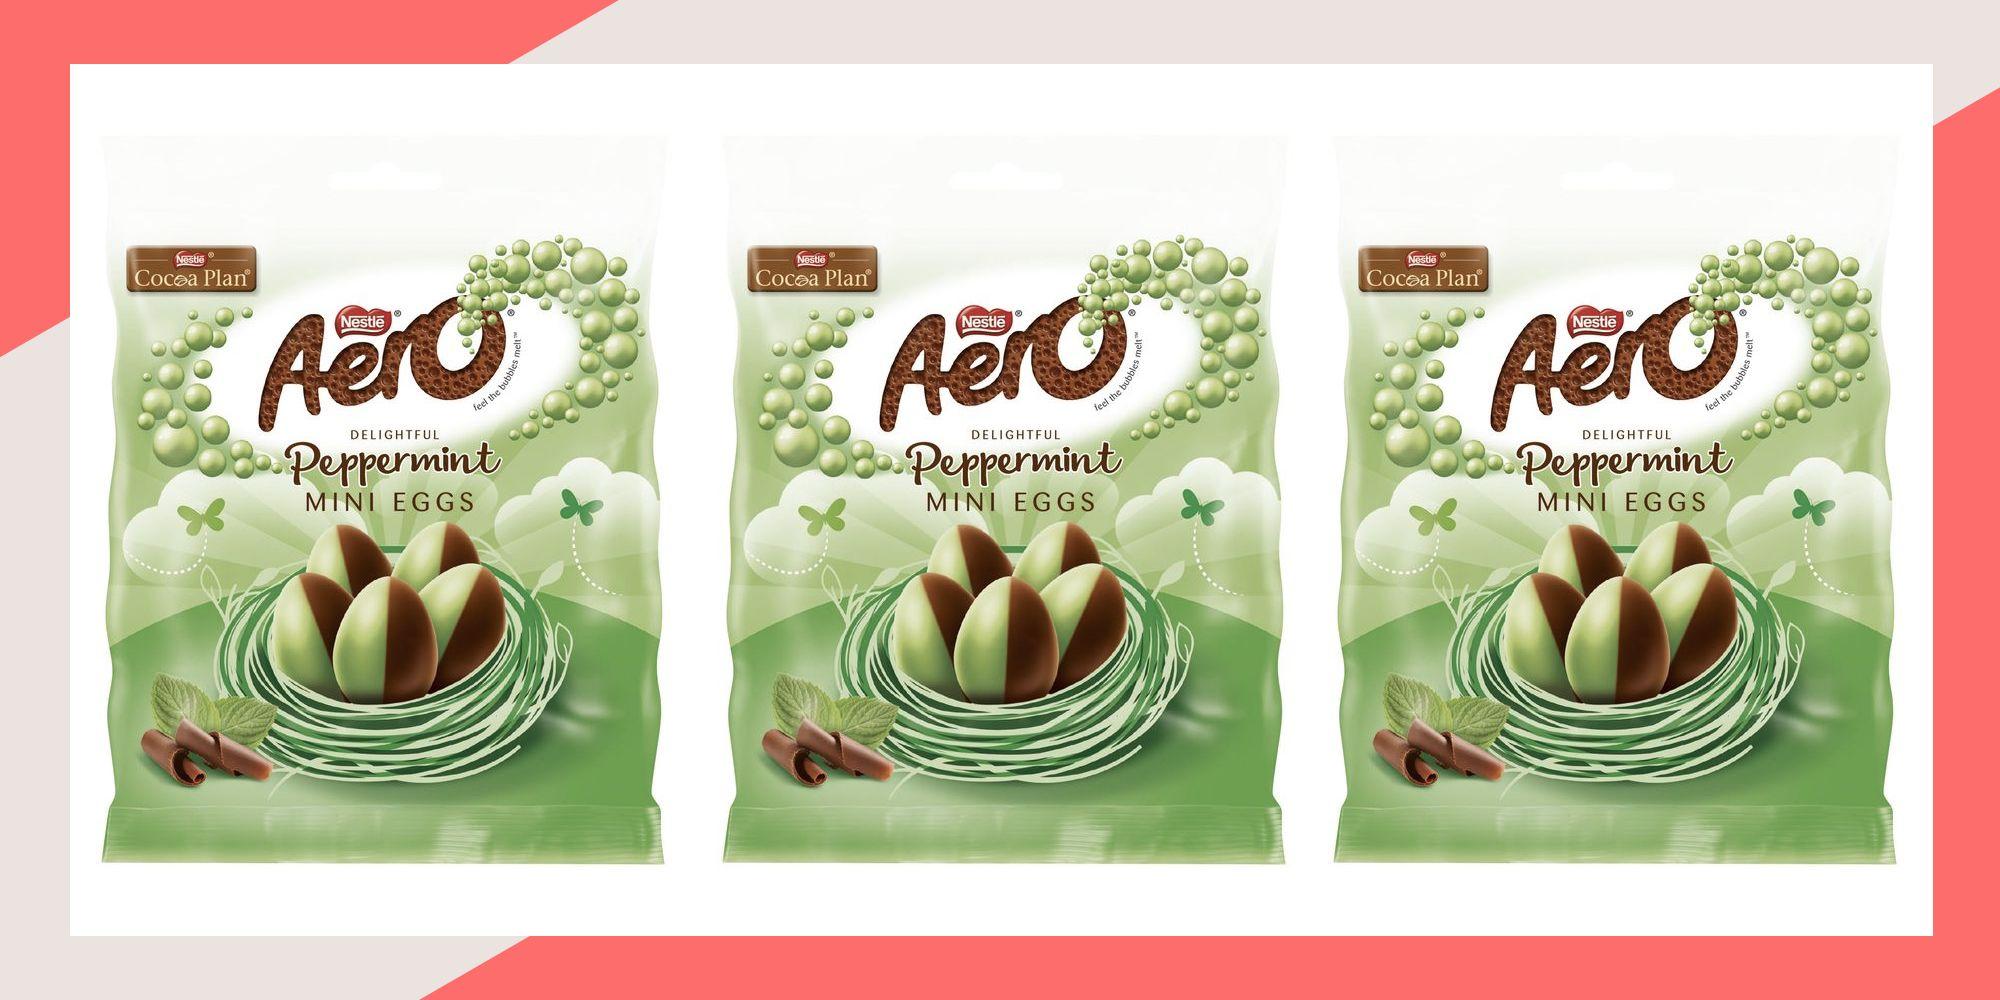 Aero Peppermint Mini Eggs Are Back For Easter